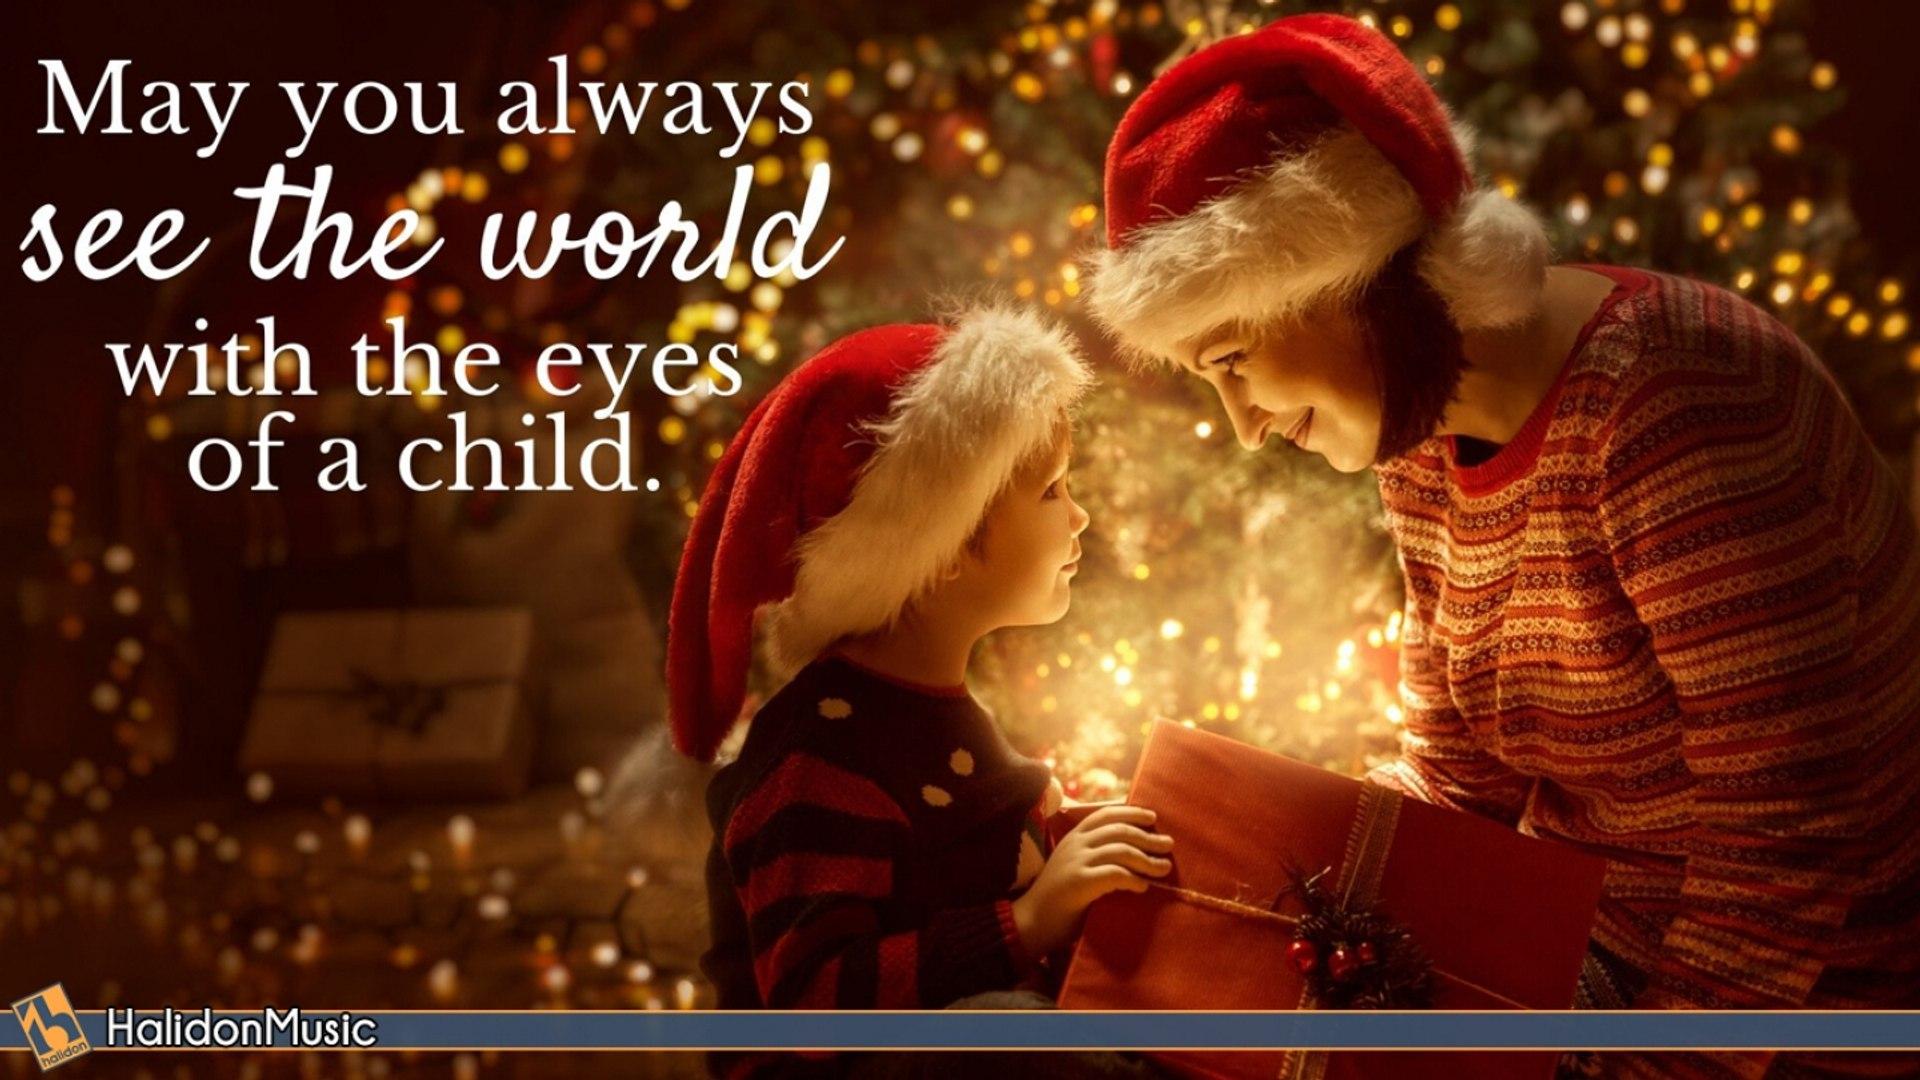 Christmas Wishes - Merry Christmas